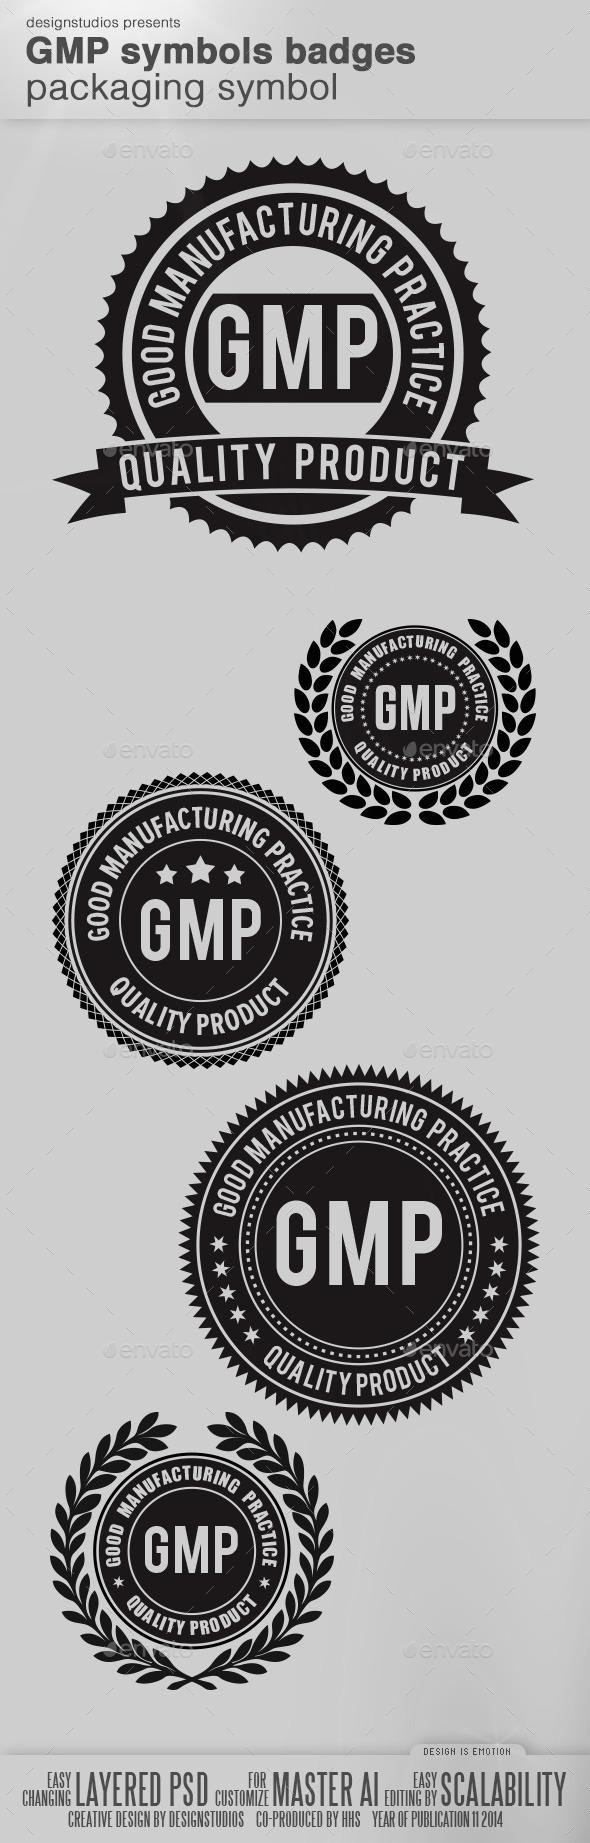 GMP Symbols Badge Packaging Symbol - Badges & Stickers Web Elements